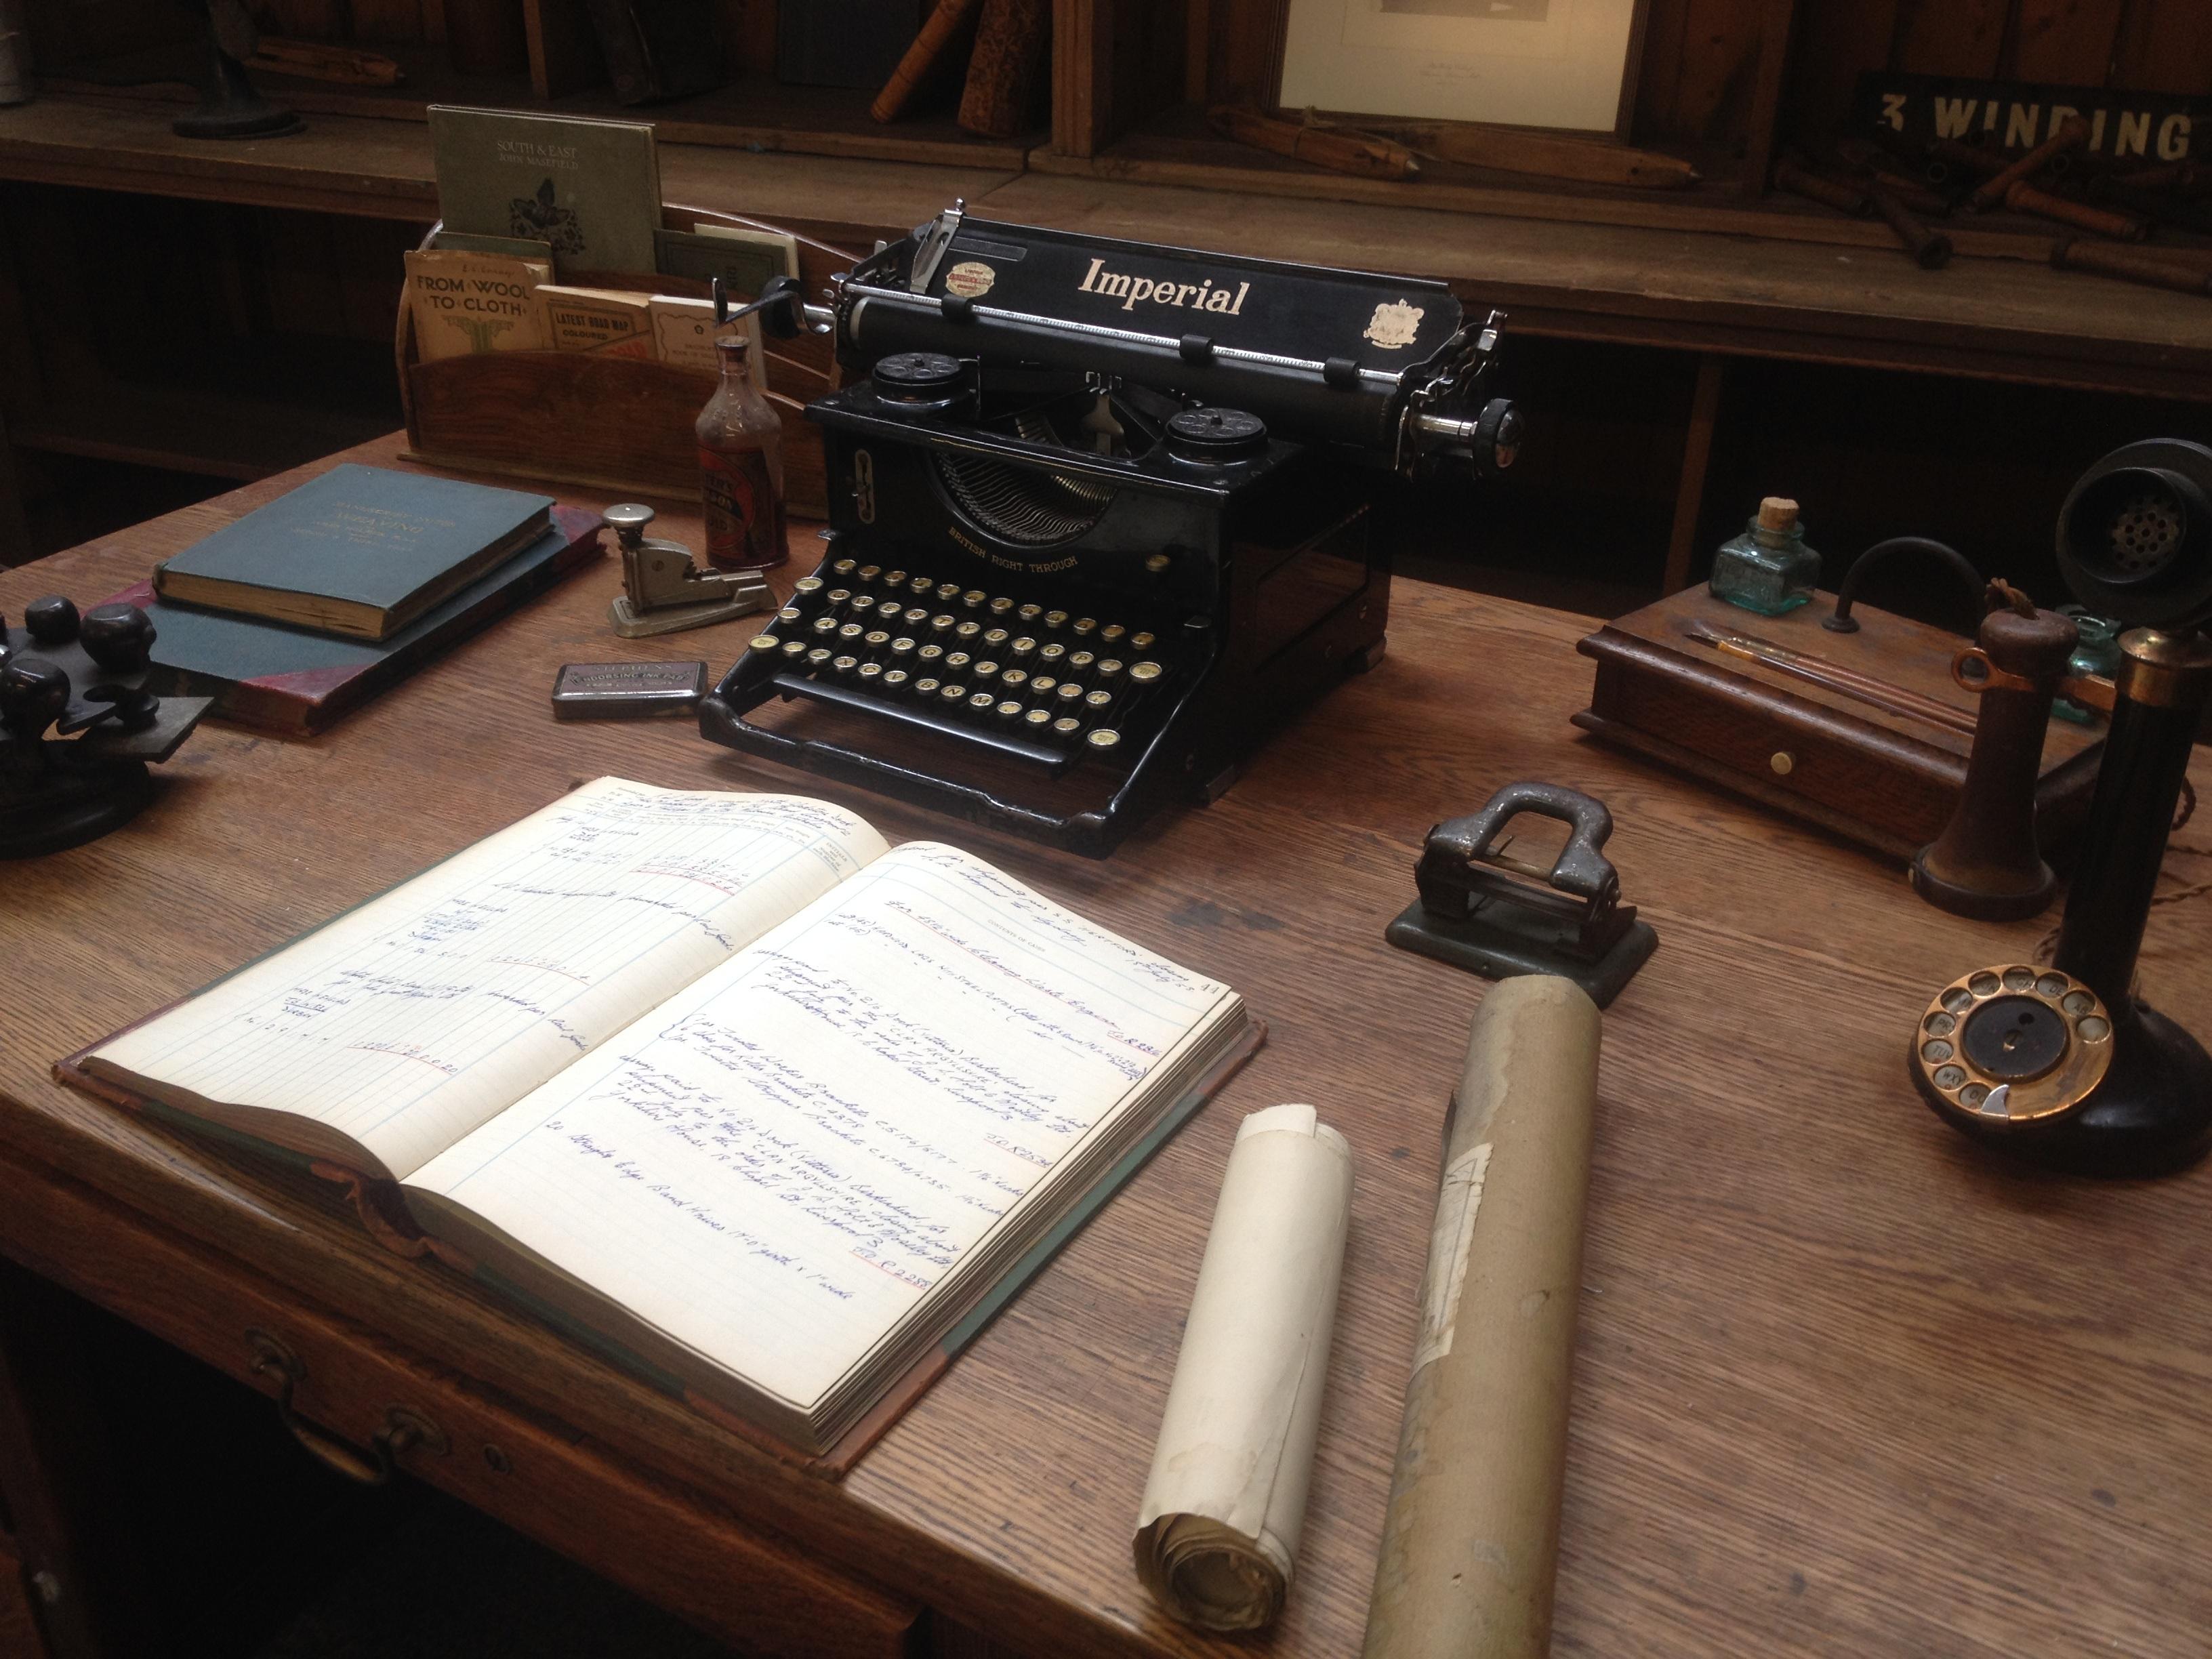 Free images technology vintage antique typewriter - Escritorio para escribir ...